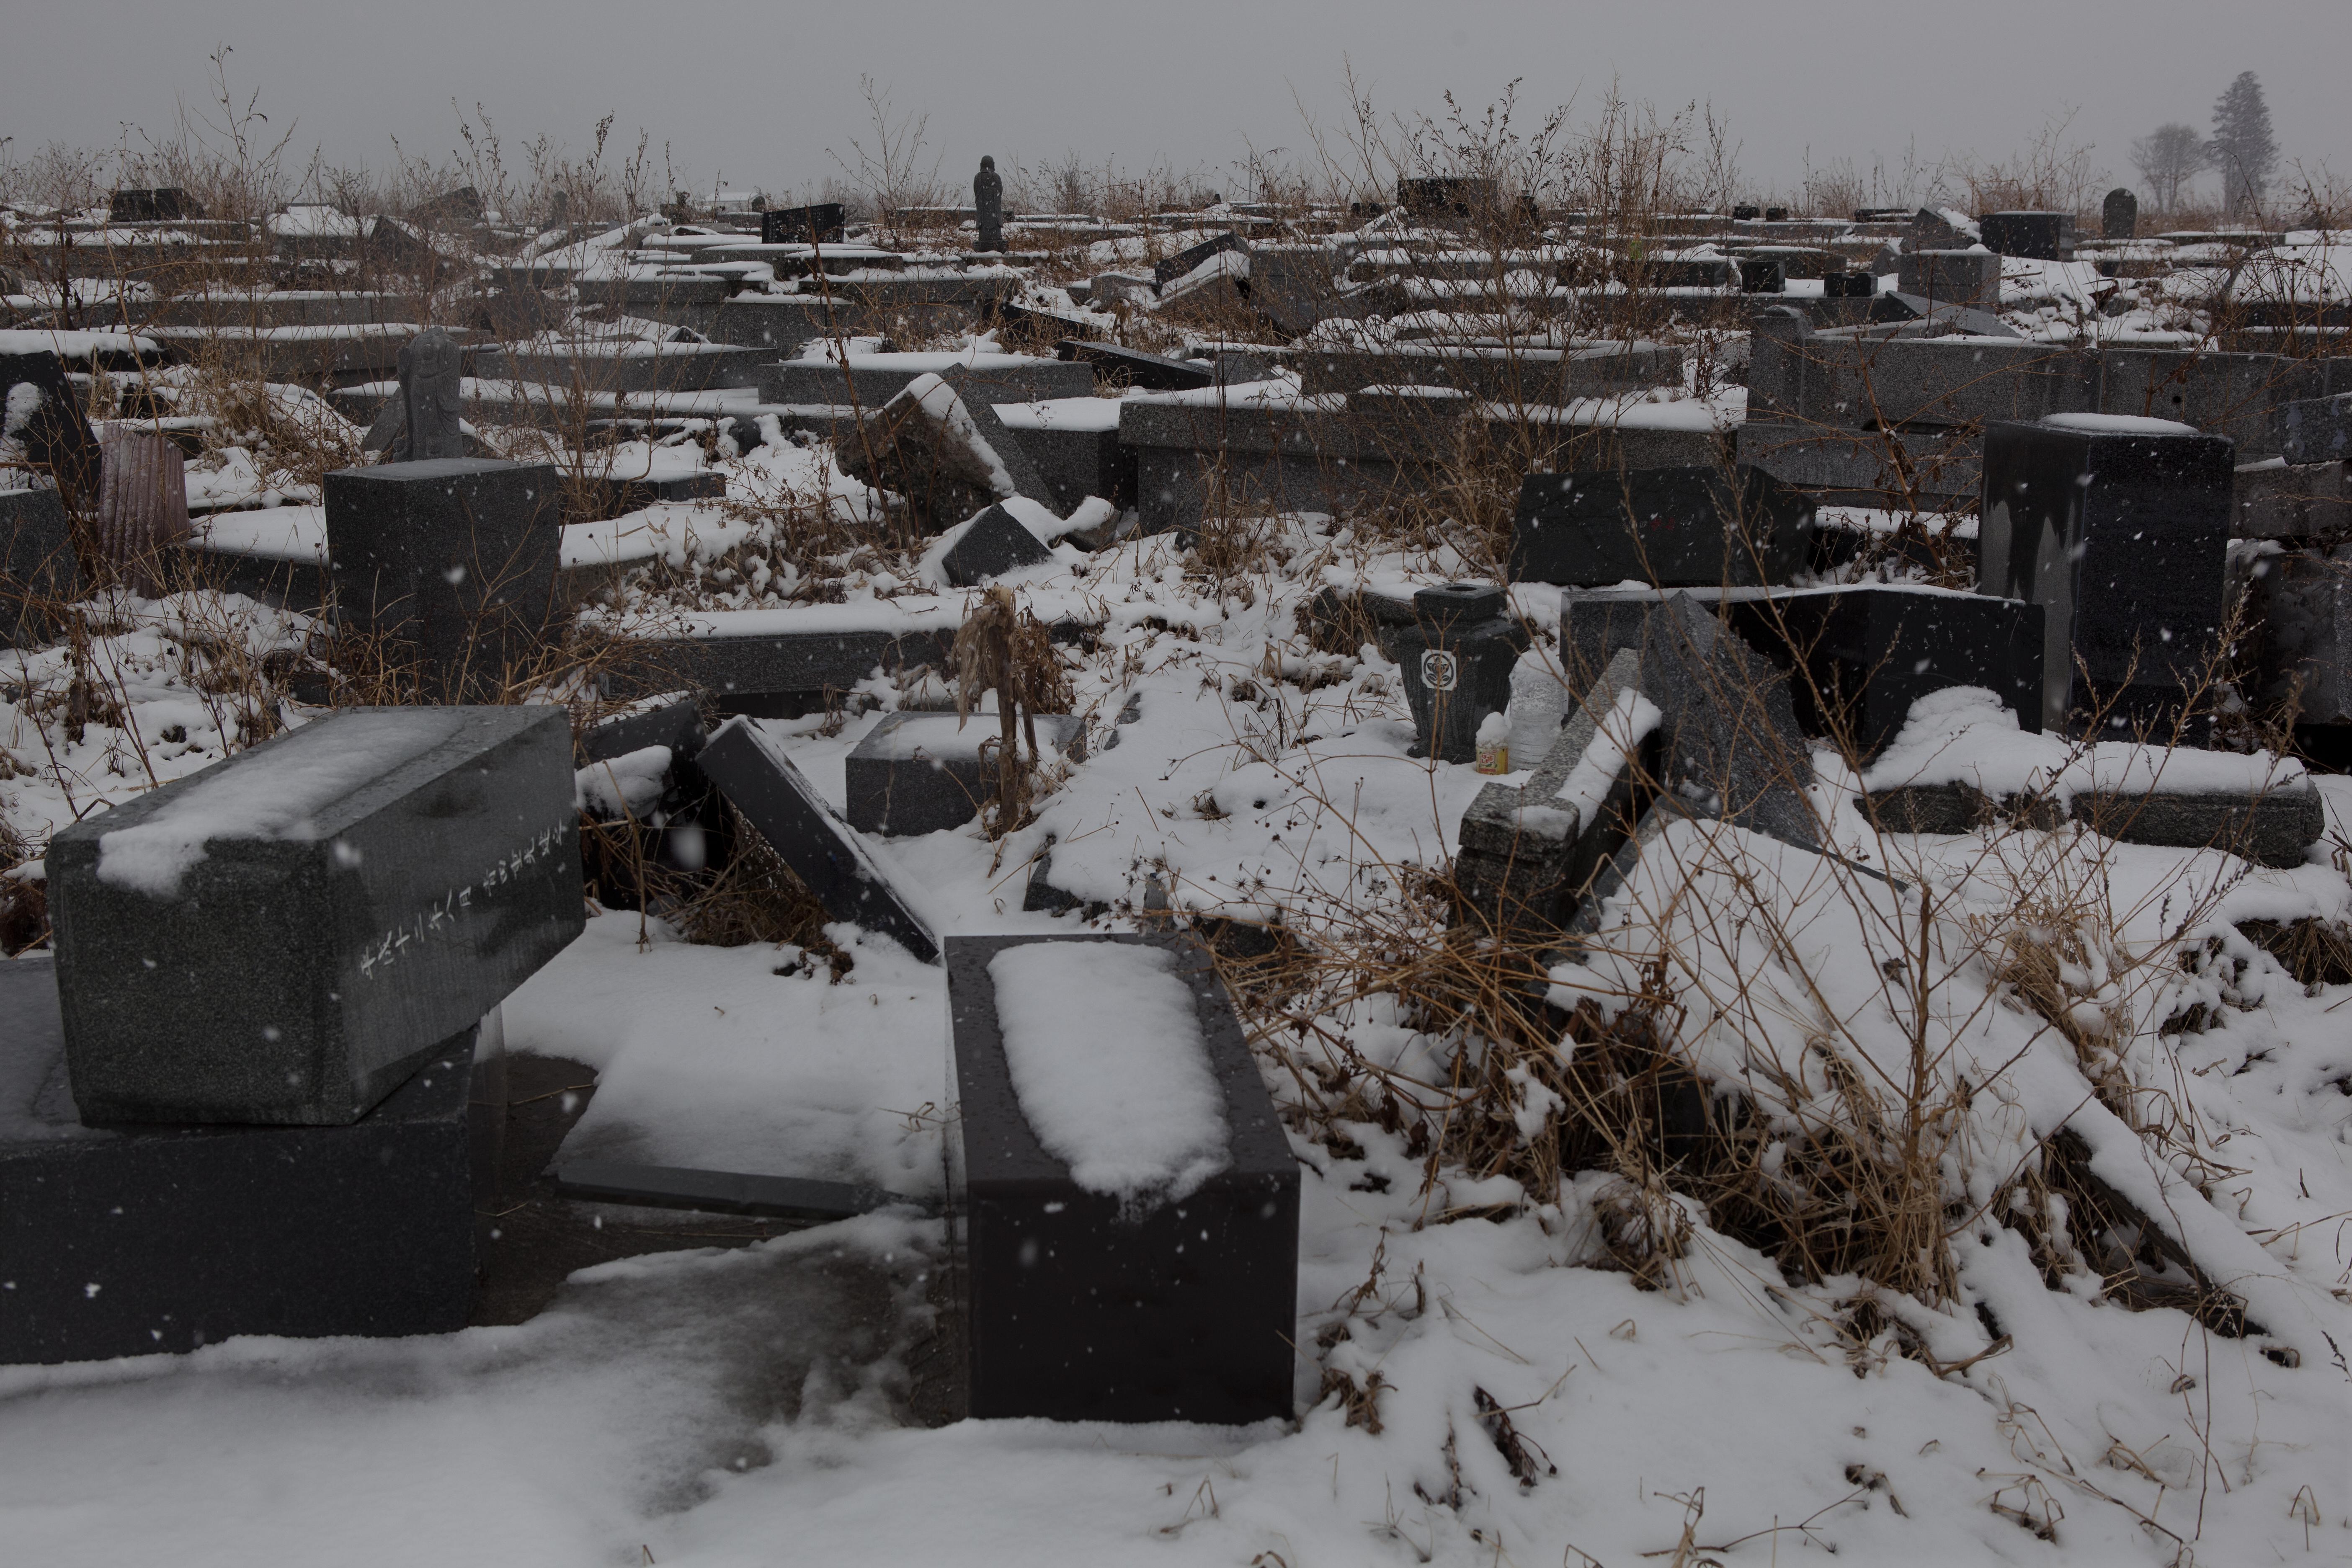 Feb. 29, 2012. Namie, Japan. Cemetery near the shore.